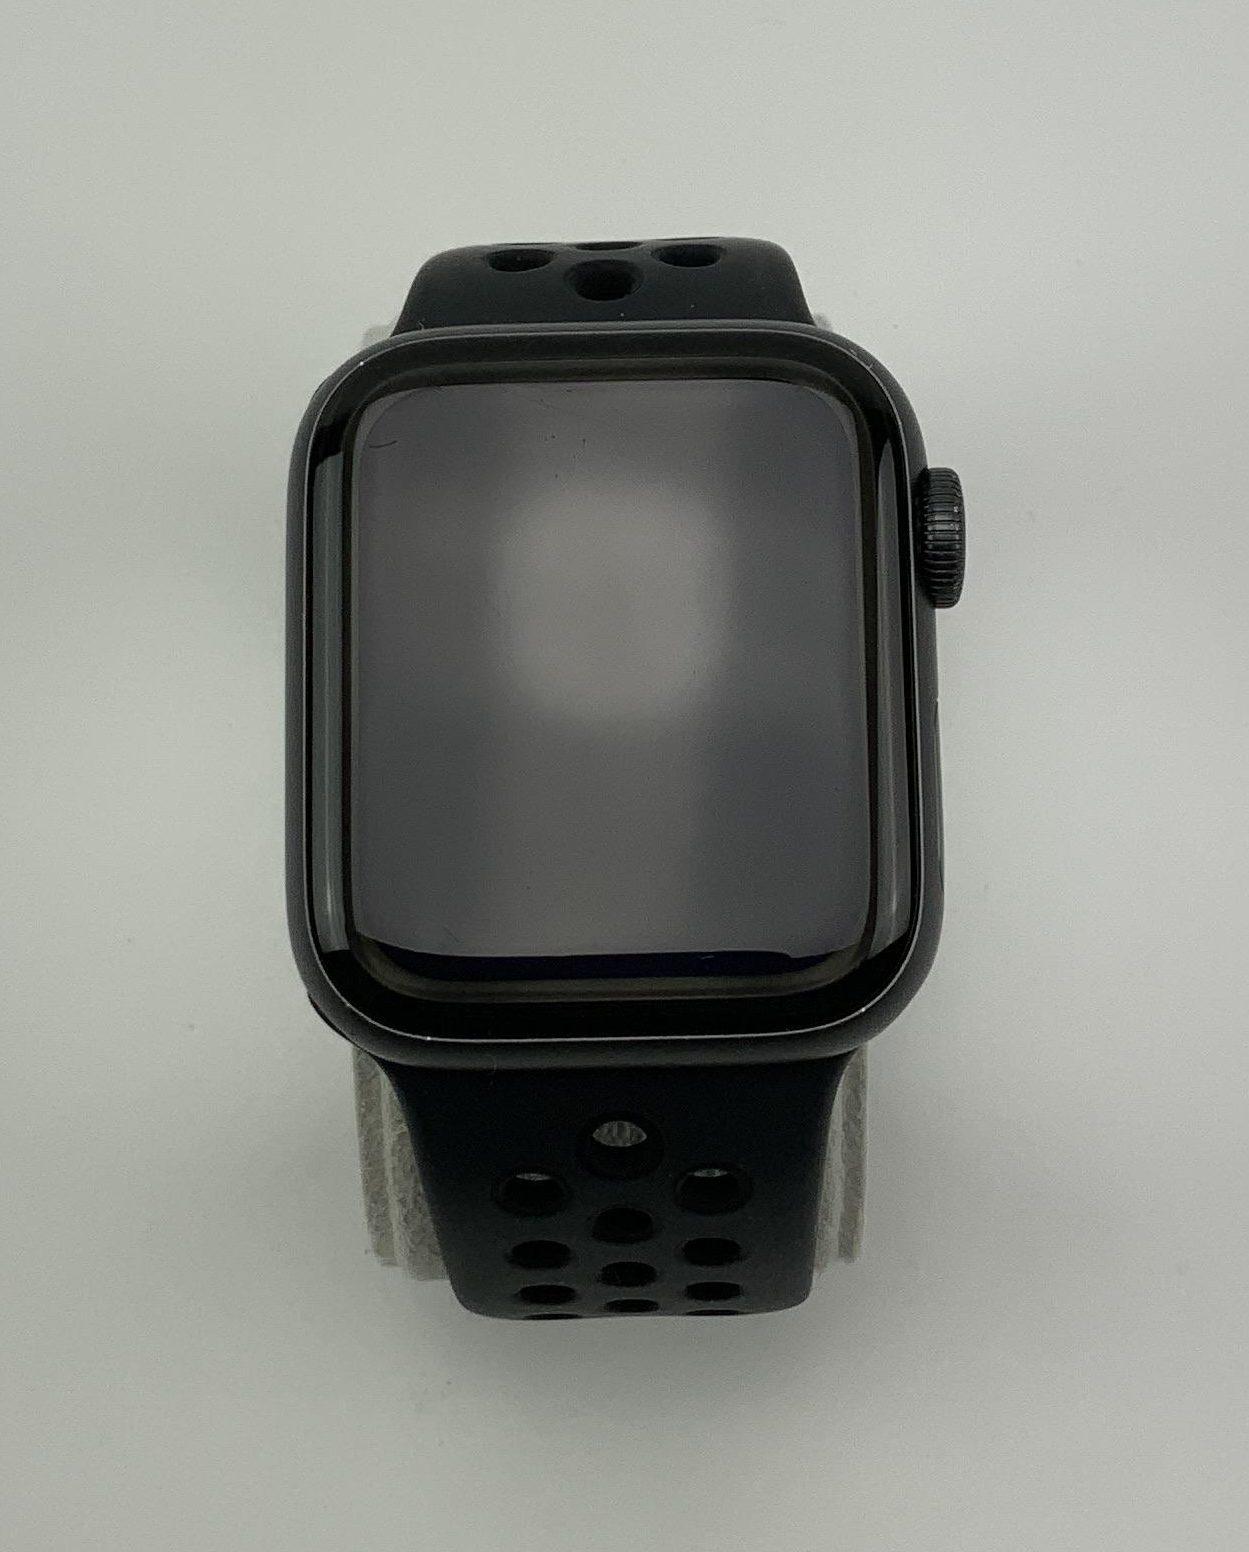 Watch Series 5 Aluminum (40mm), Space Gray, Bild 1